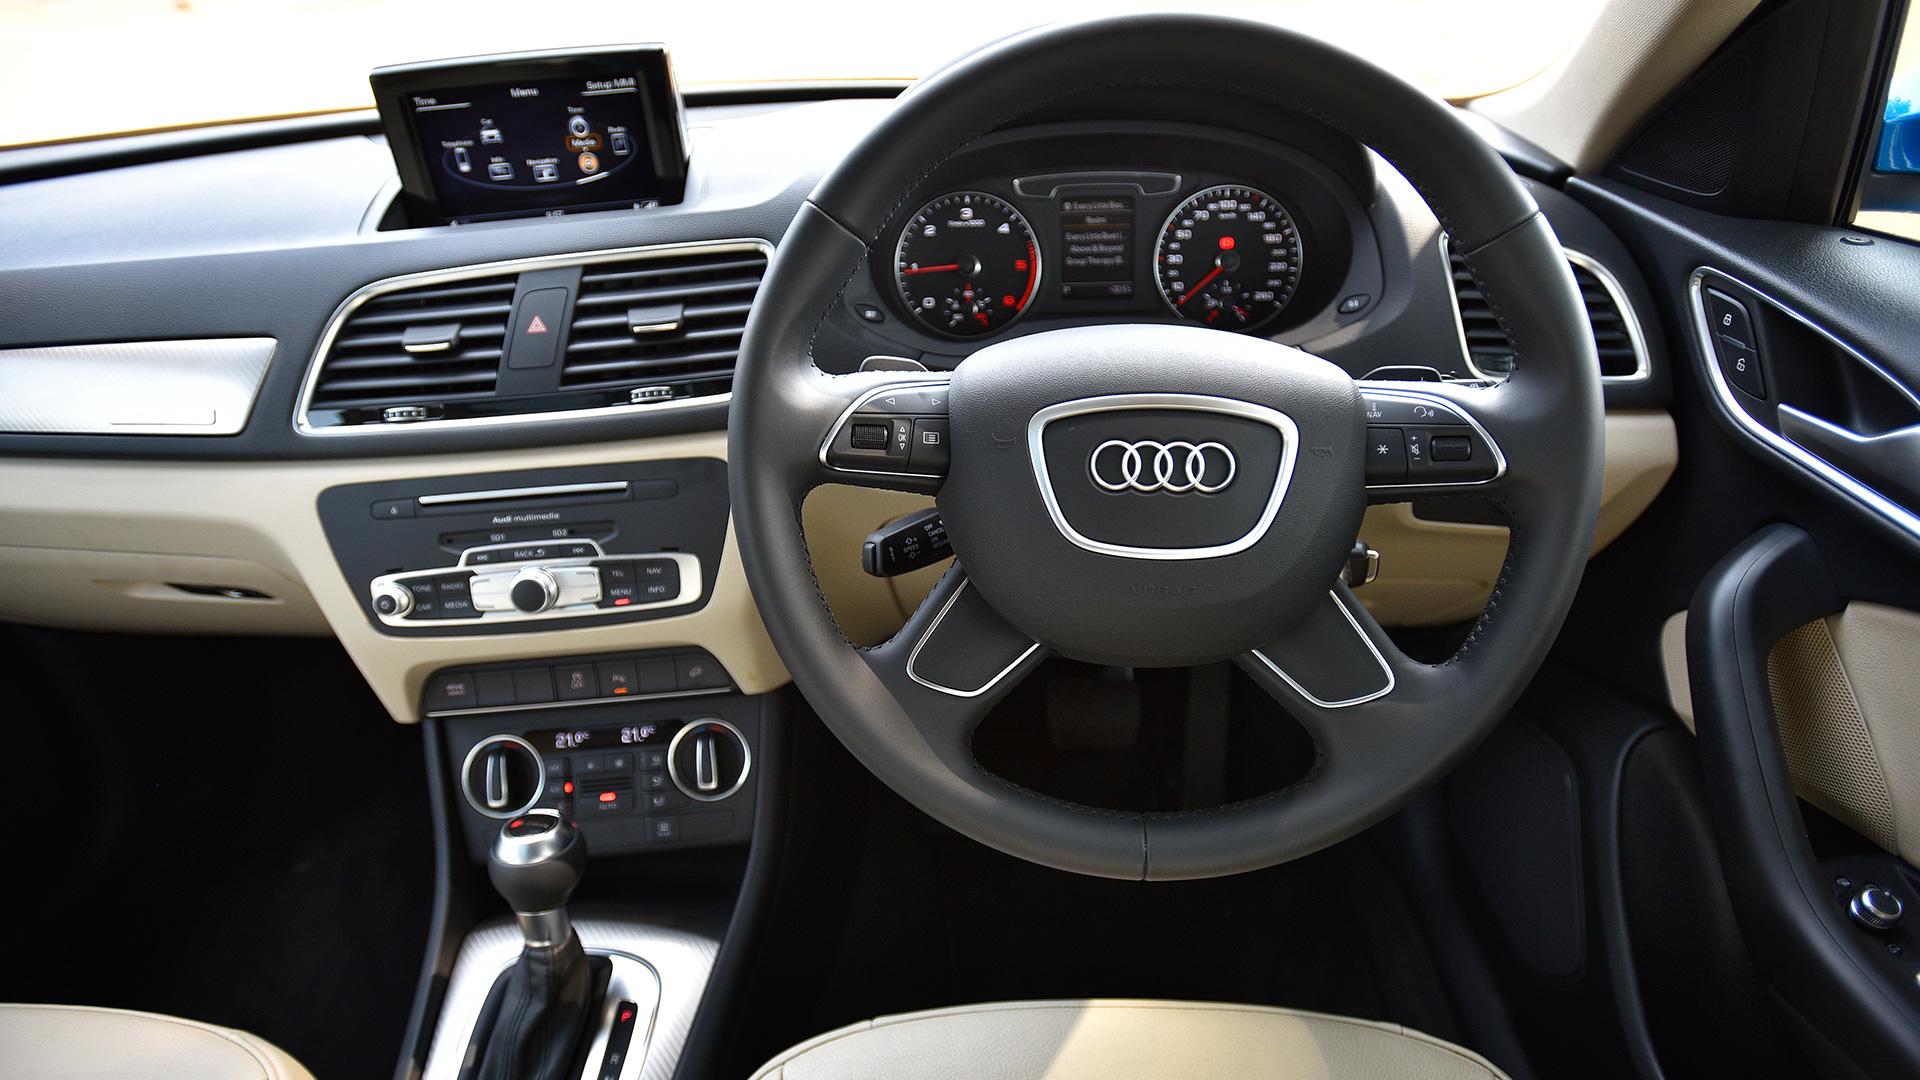 Audi Q Price Mileage Reviews Specification Gallery - Audi car q3 price in india